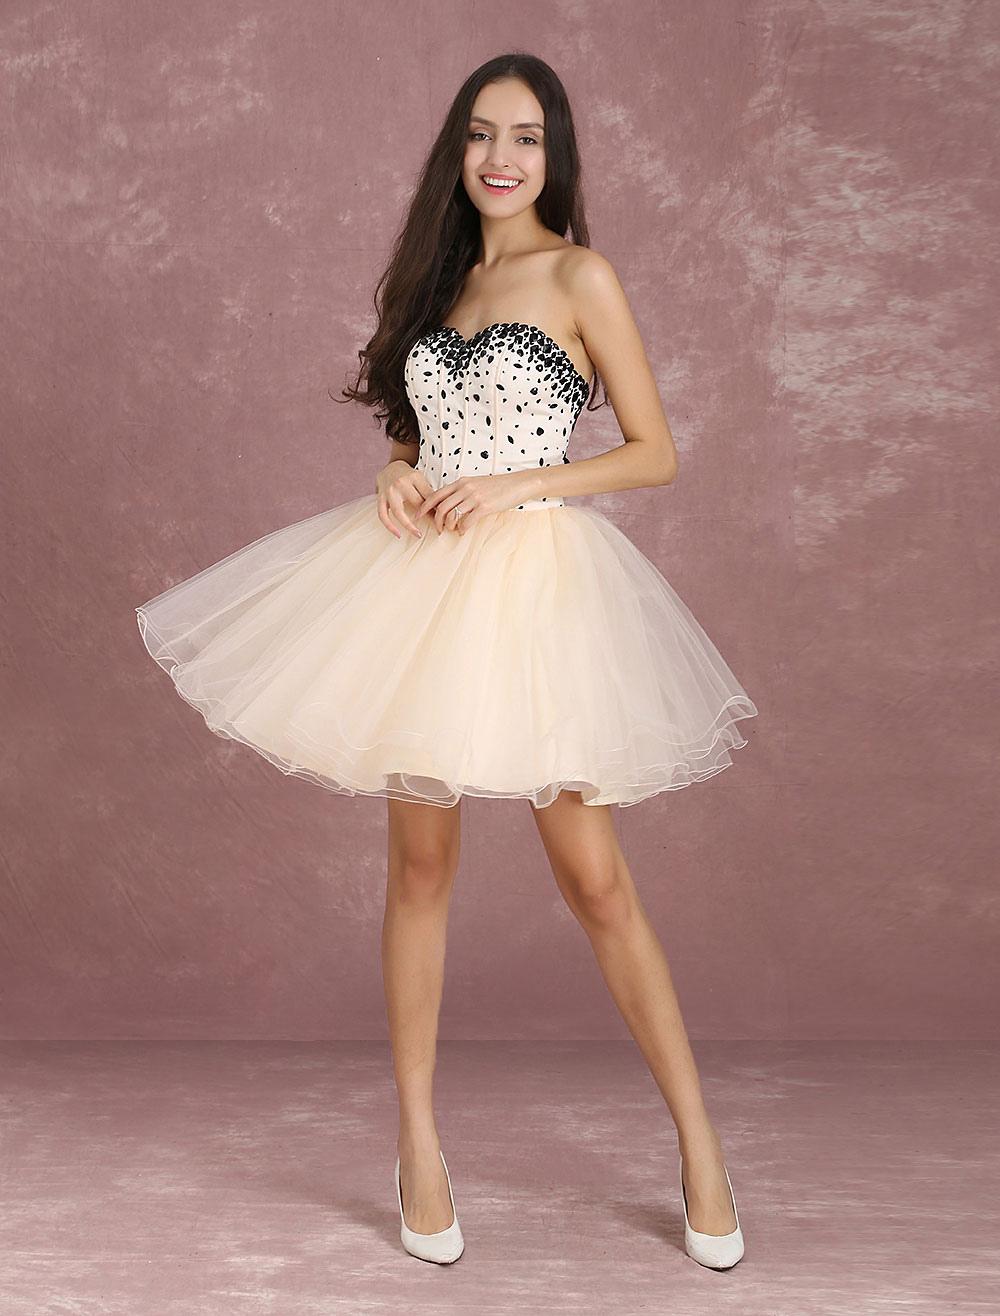 Champagne Homecoming Dresses Mini Sweetheart Strapless Short Prom Dress Tulle Beading Boned Party Dresses